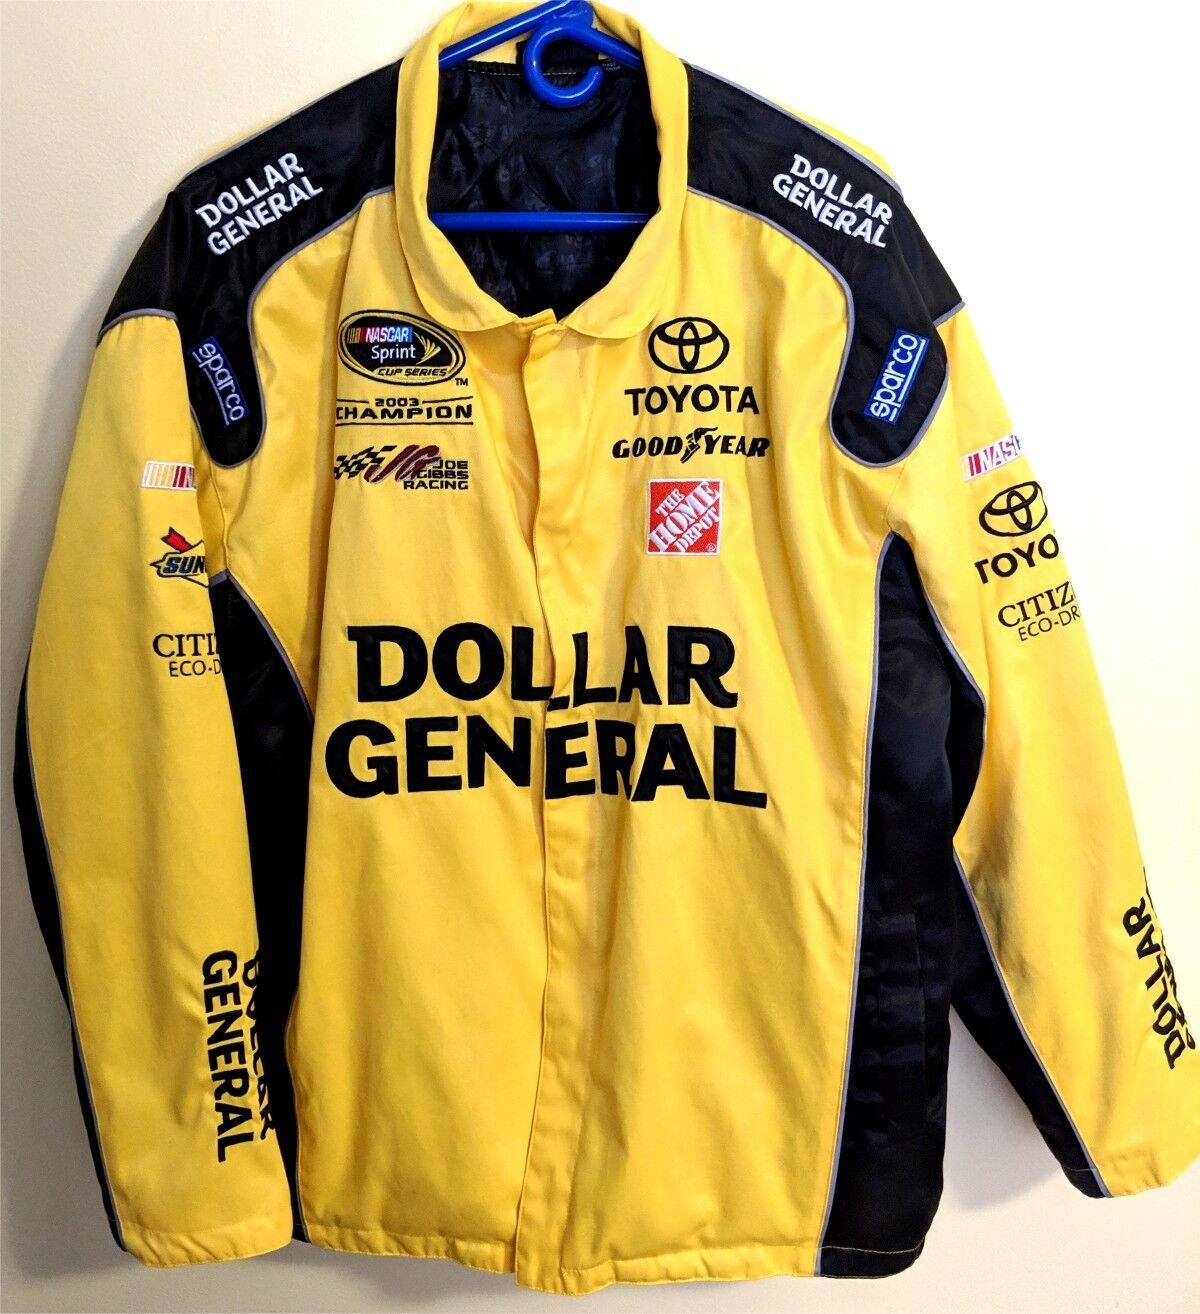 DOLLAR GENERAL RACING COAT - Officially  NASCAR Licensed - Matt Kenseth  XL Nice  cheap designer brands